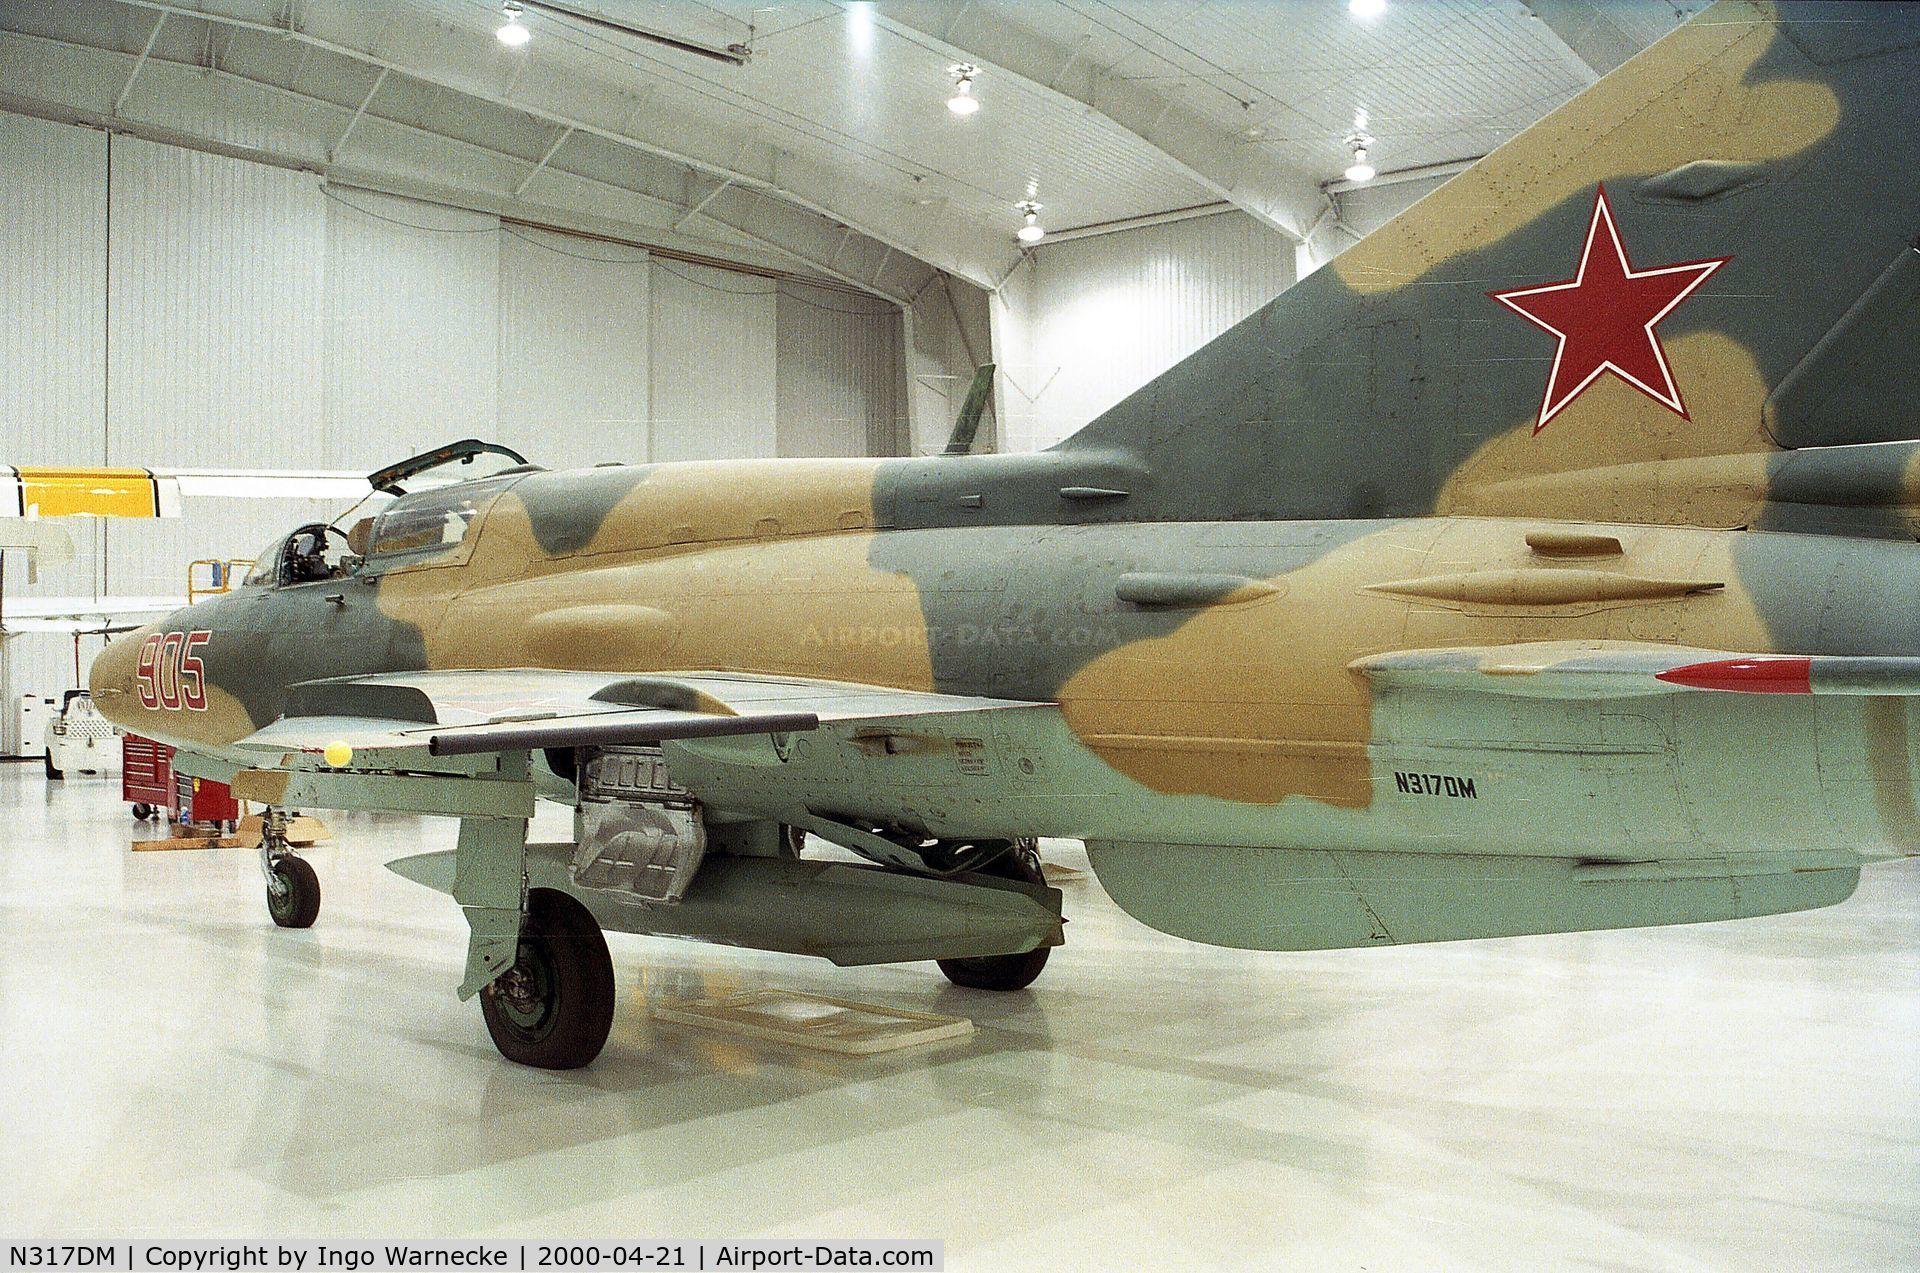 N317DM, 1974 Mikoyan-Gurevich MiG-21UM Lancer B C/N 516913056, Mikoyan i Gurevich MiG-21UM MONGOL at the Polar Aviation Museum, Blaine MN